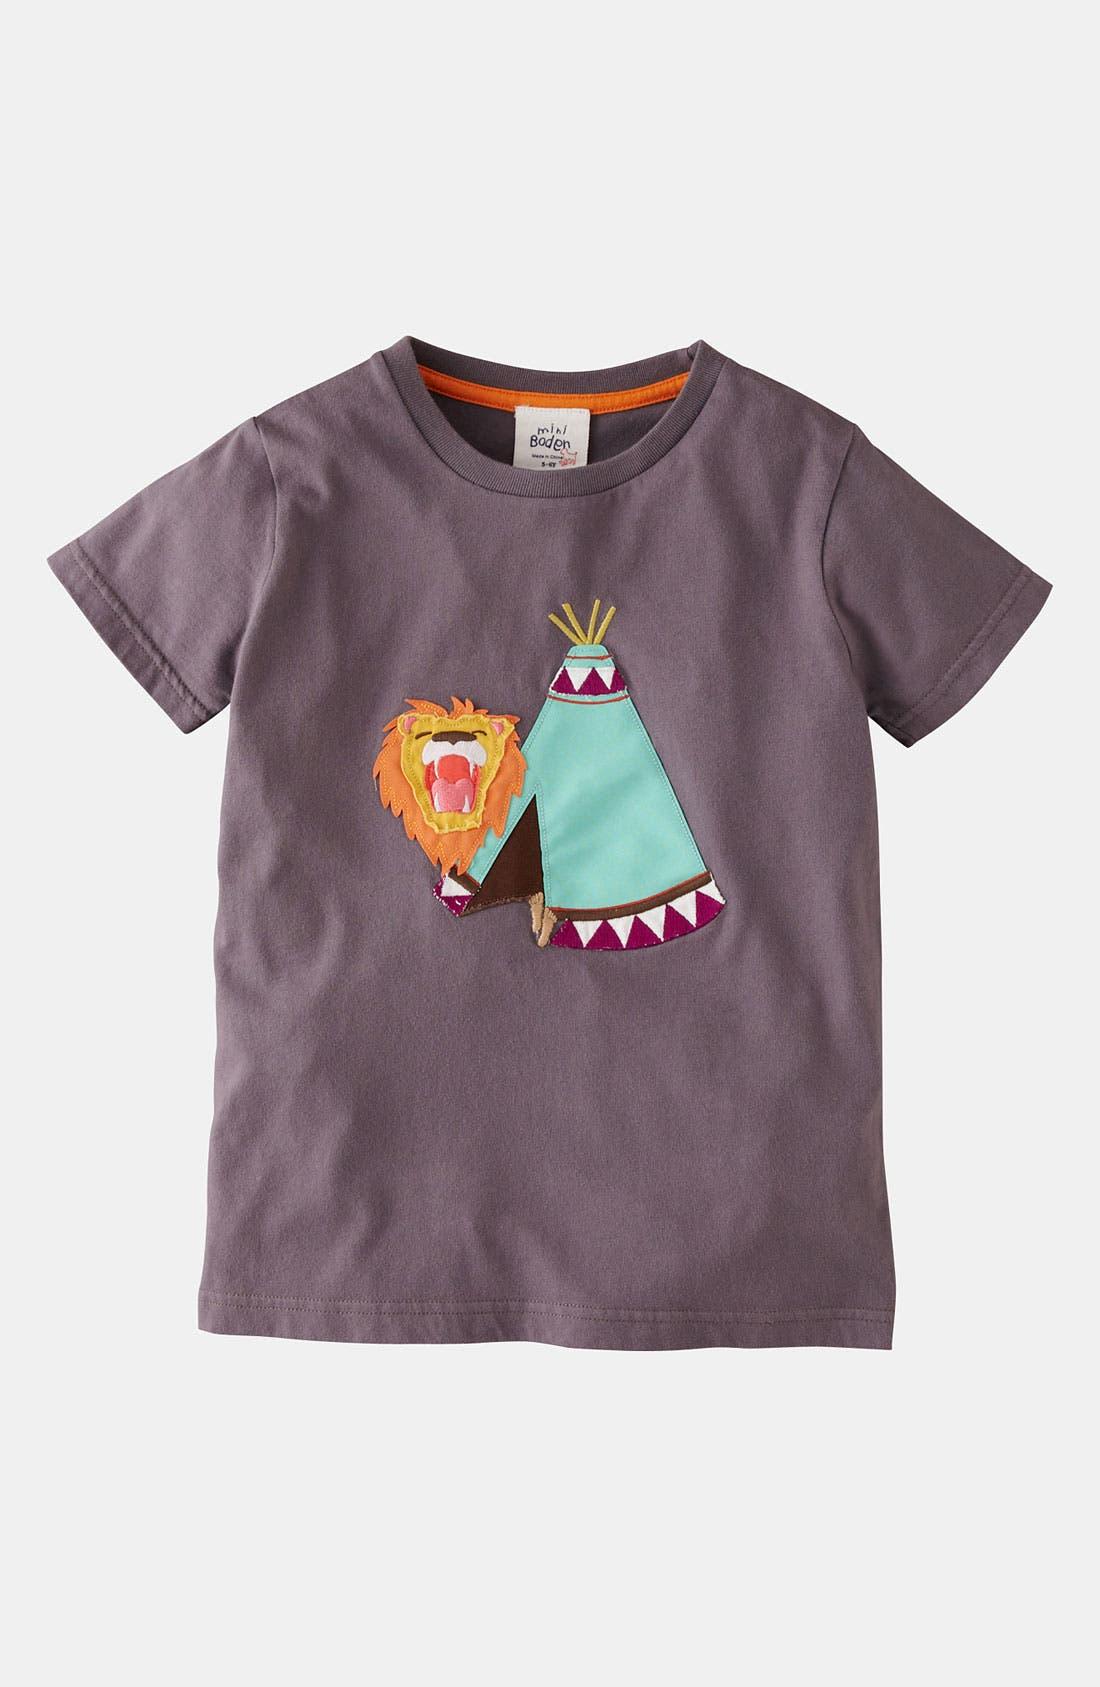 Alternate Image 1 Selected - Mini Boden 'Adventure Appliqué' T-Shirt (Toddler, Little Boys & Big Boys)